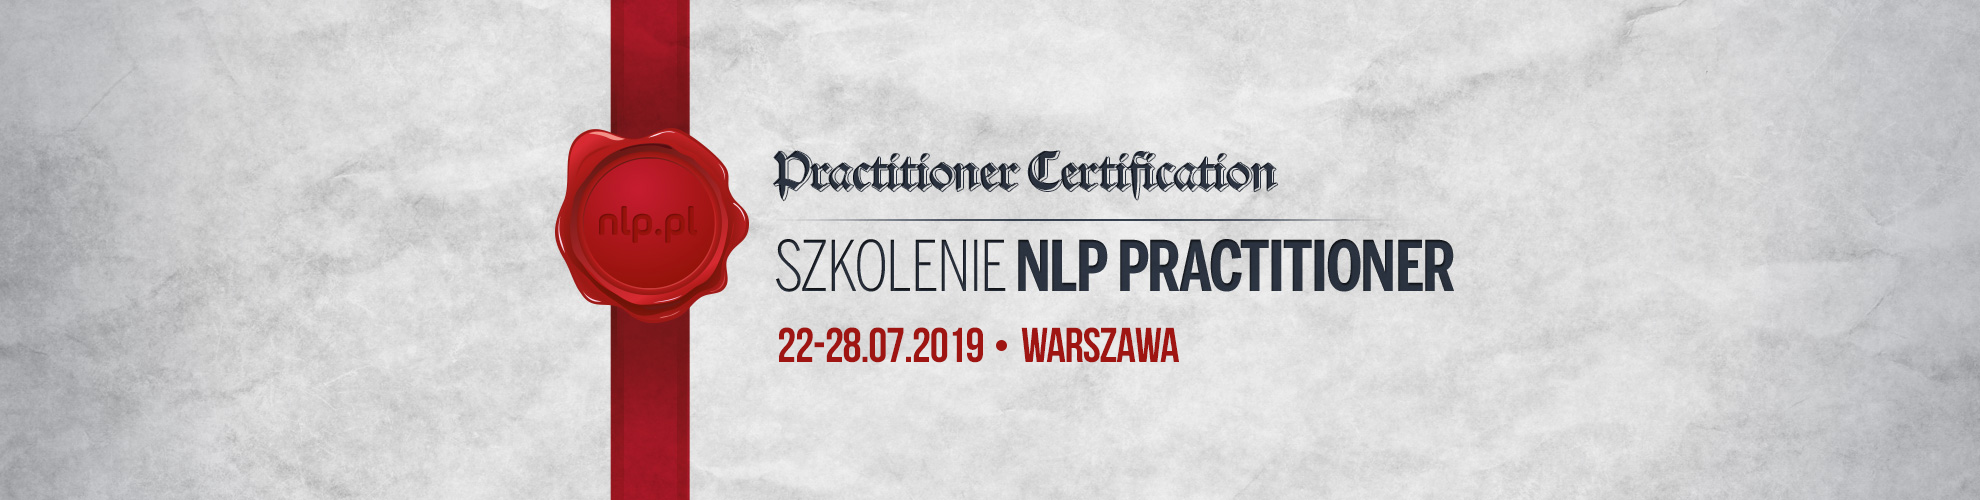 NLP-PRACTITIONER-07.2019